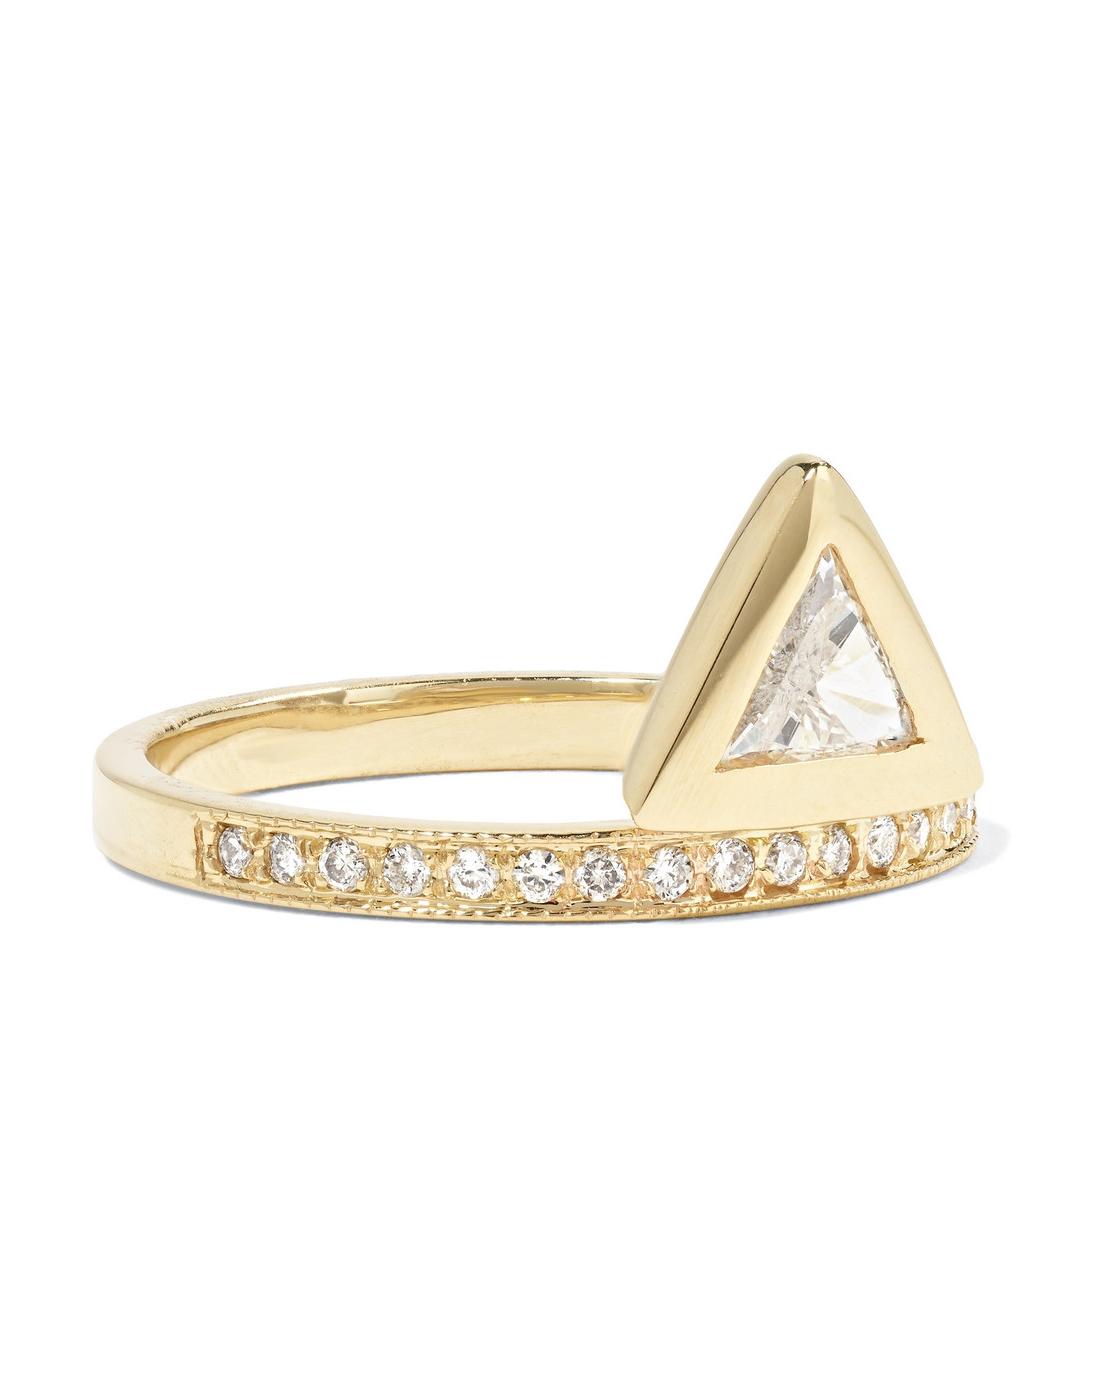 bezel-set trillion-cut diamond engagement ring